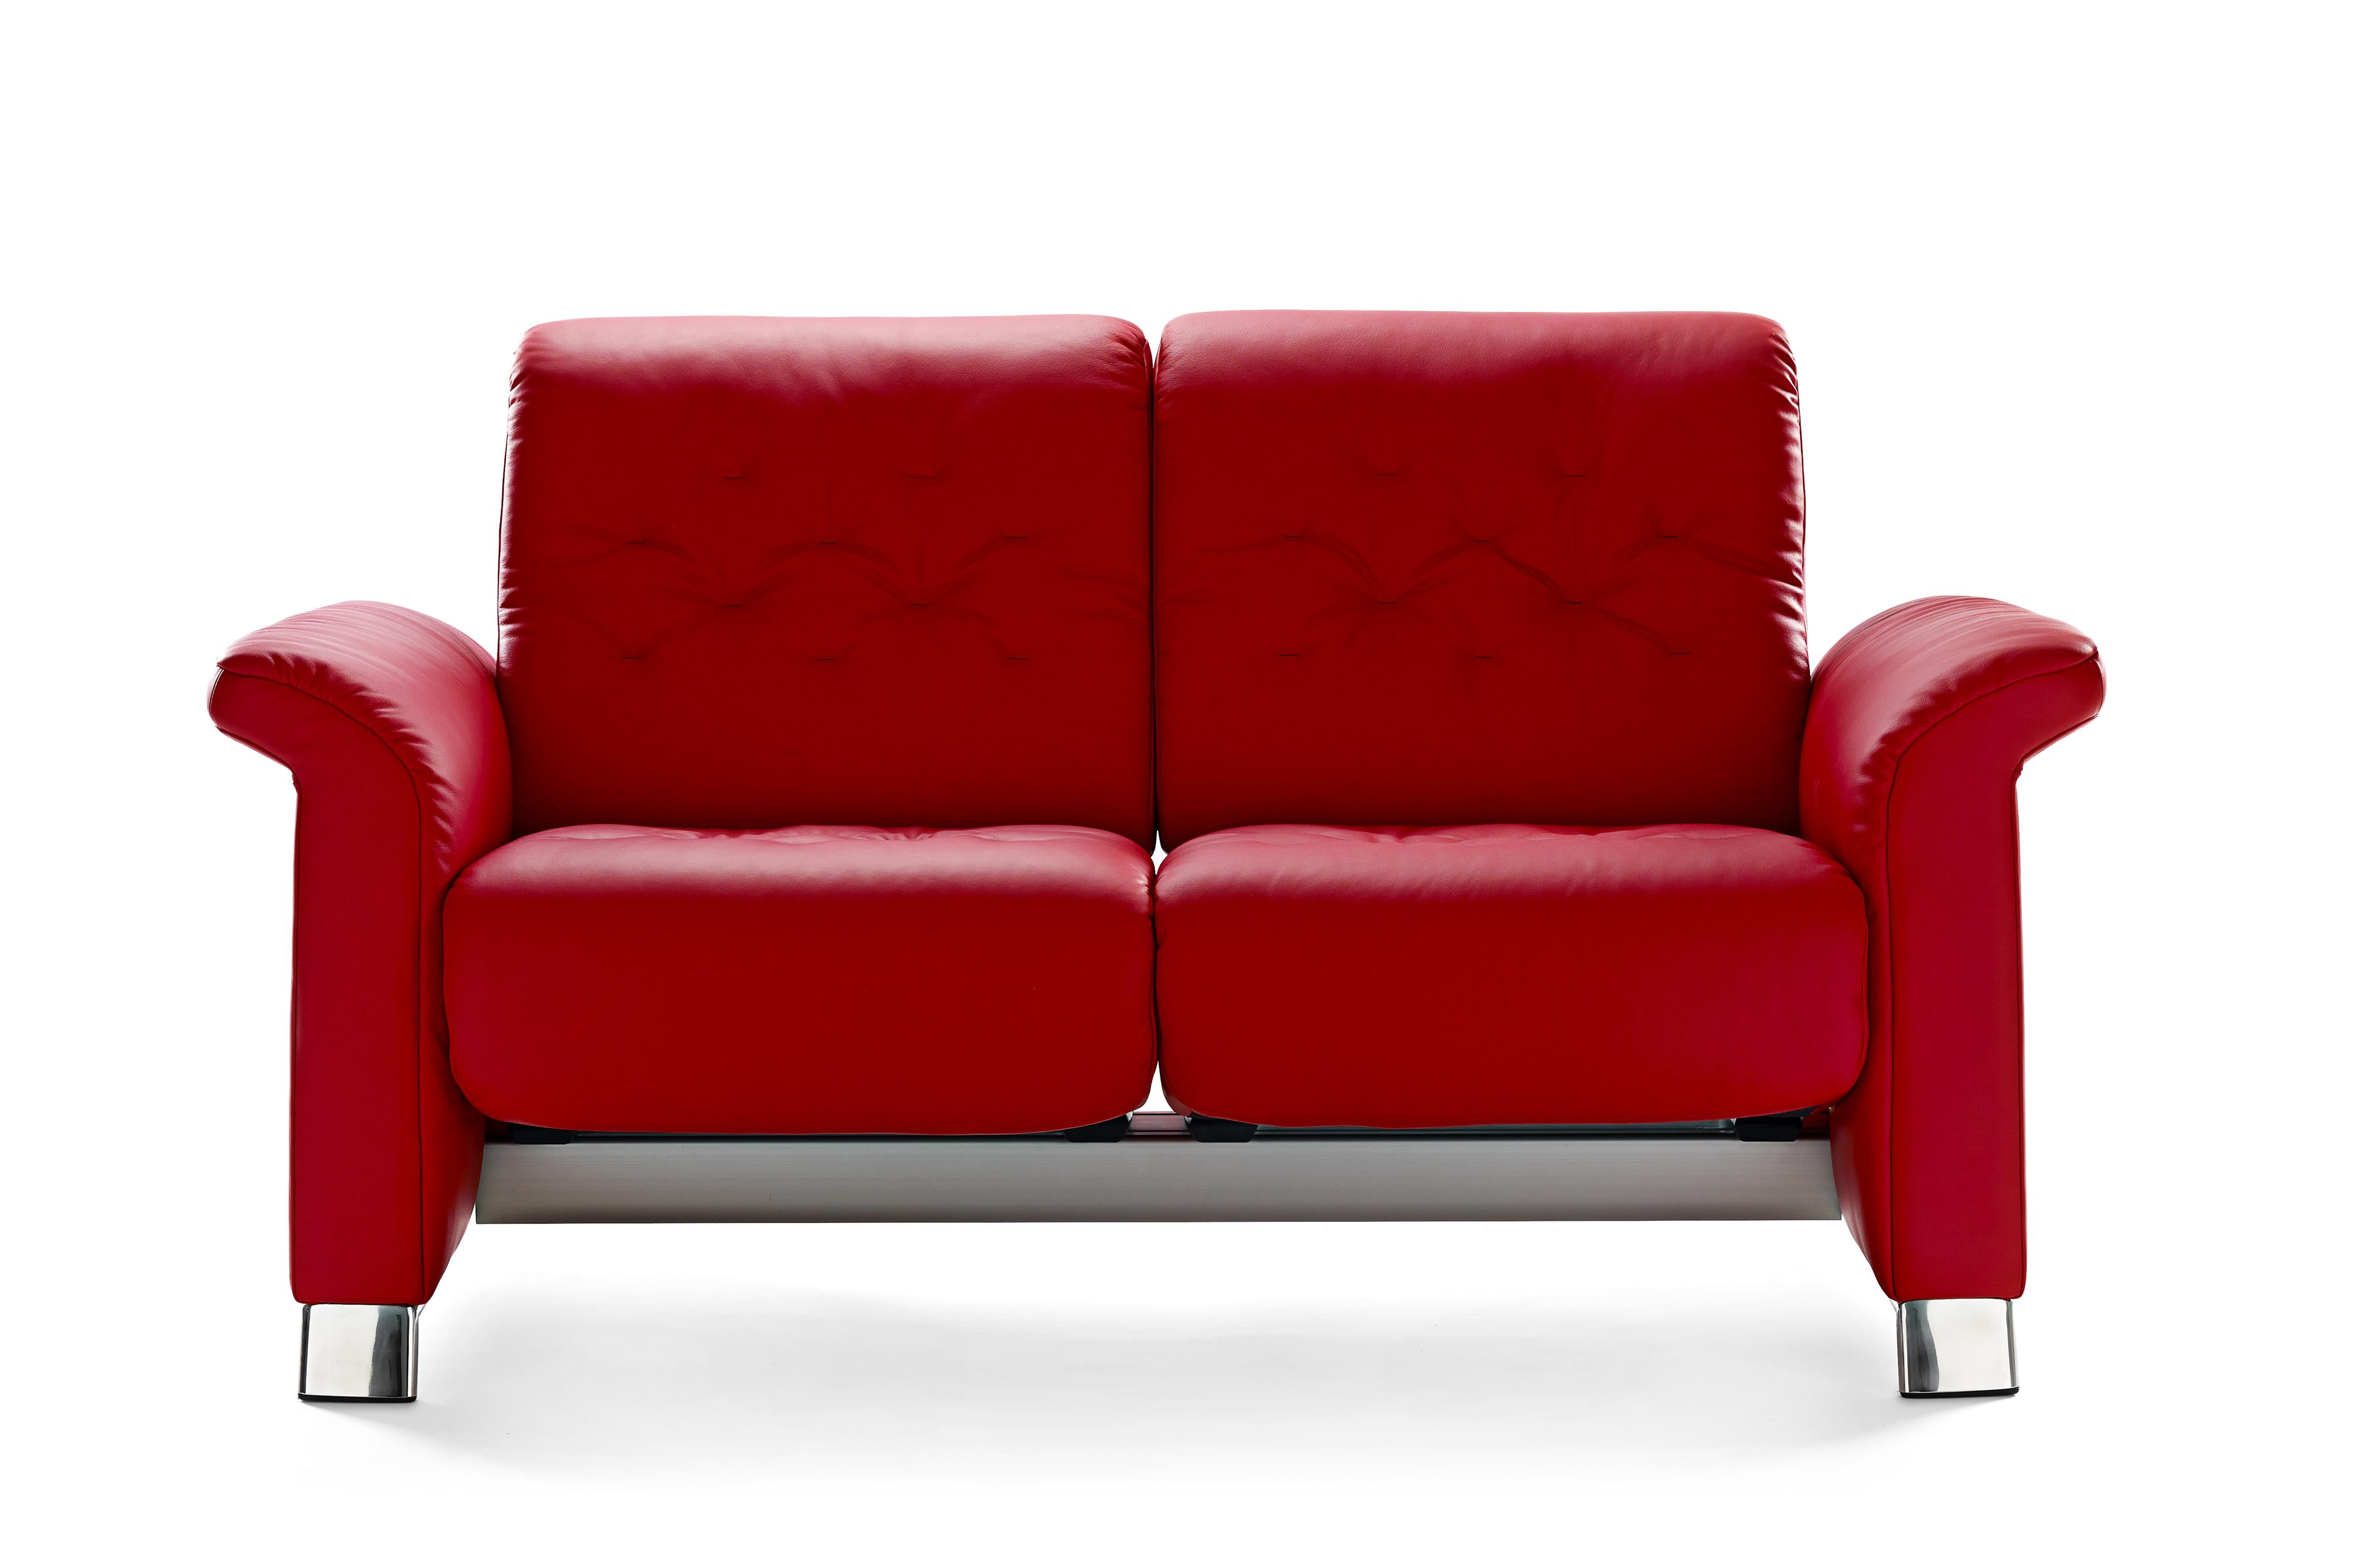 Stressless By Ekornes Stressless Metropolitan 1400020 Contemporary 2 Seater Sofa Dunk Bright